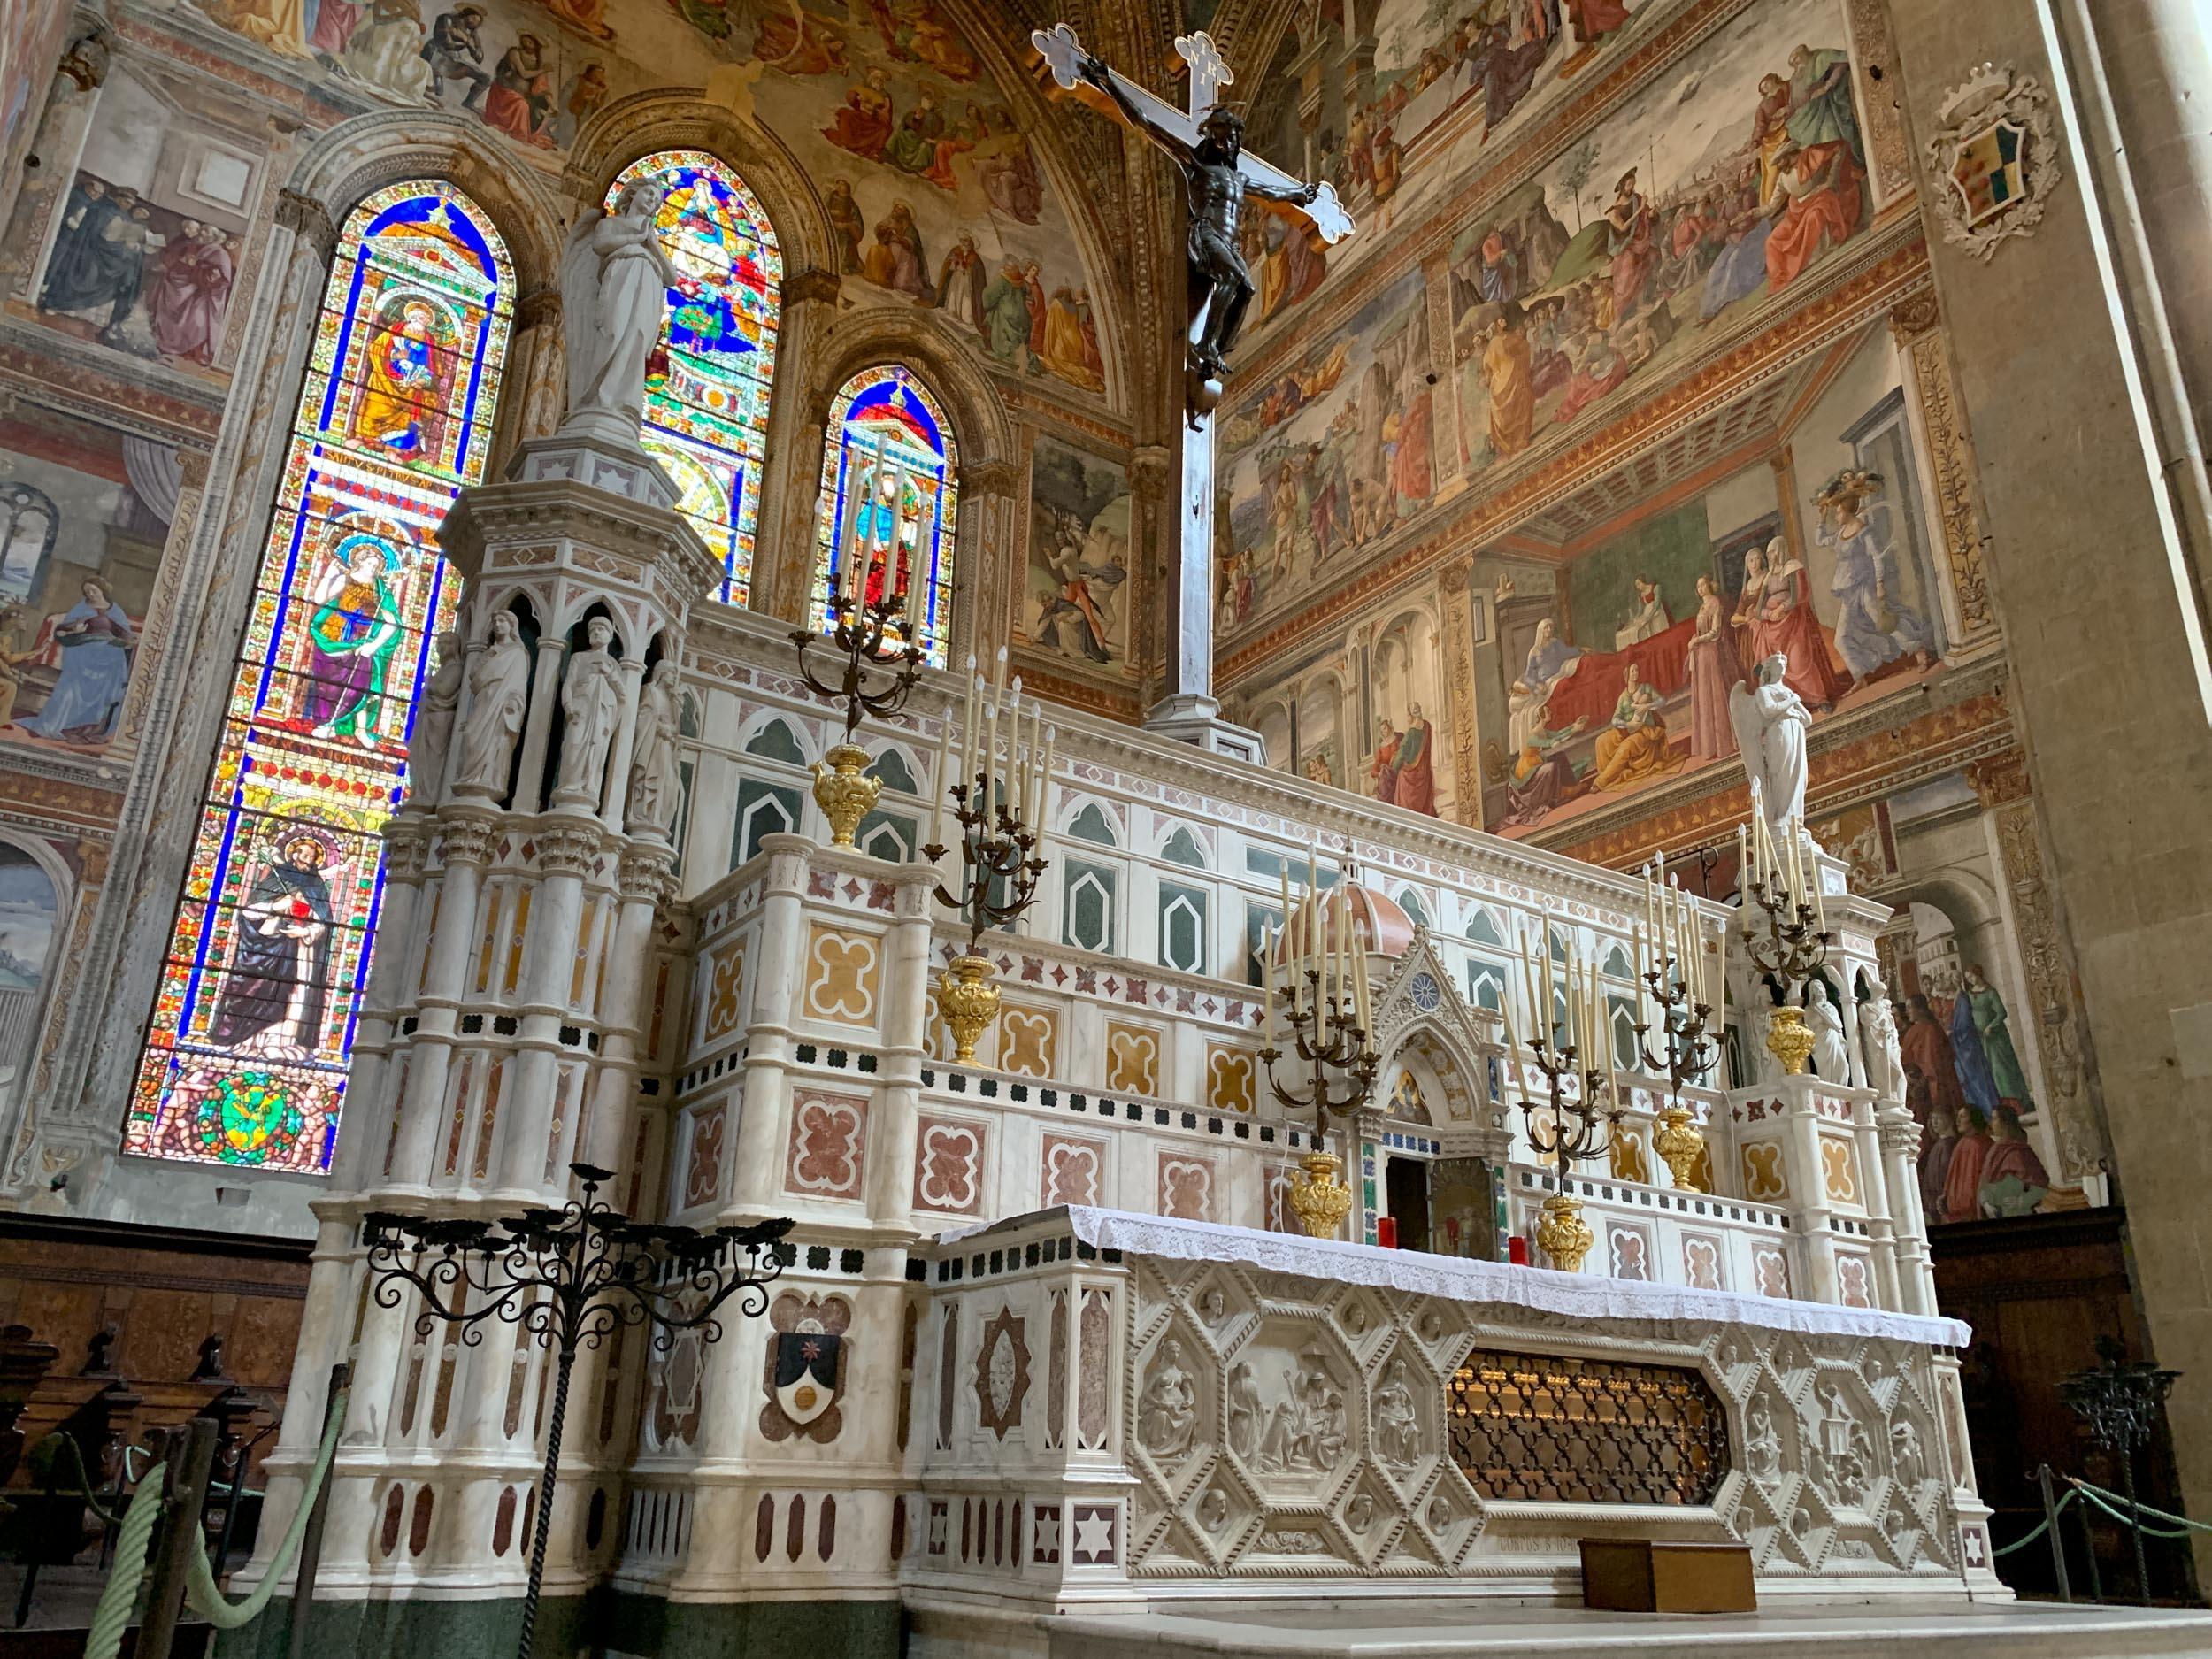 Pulpit designed by Filippo Brunelleschi